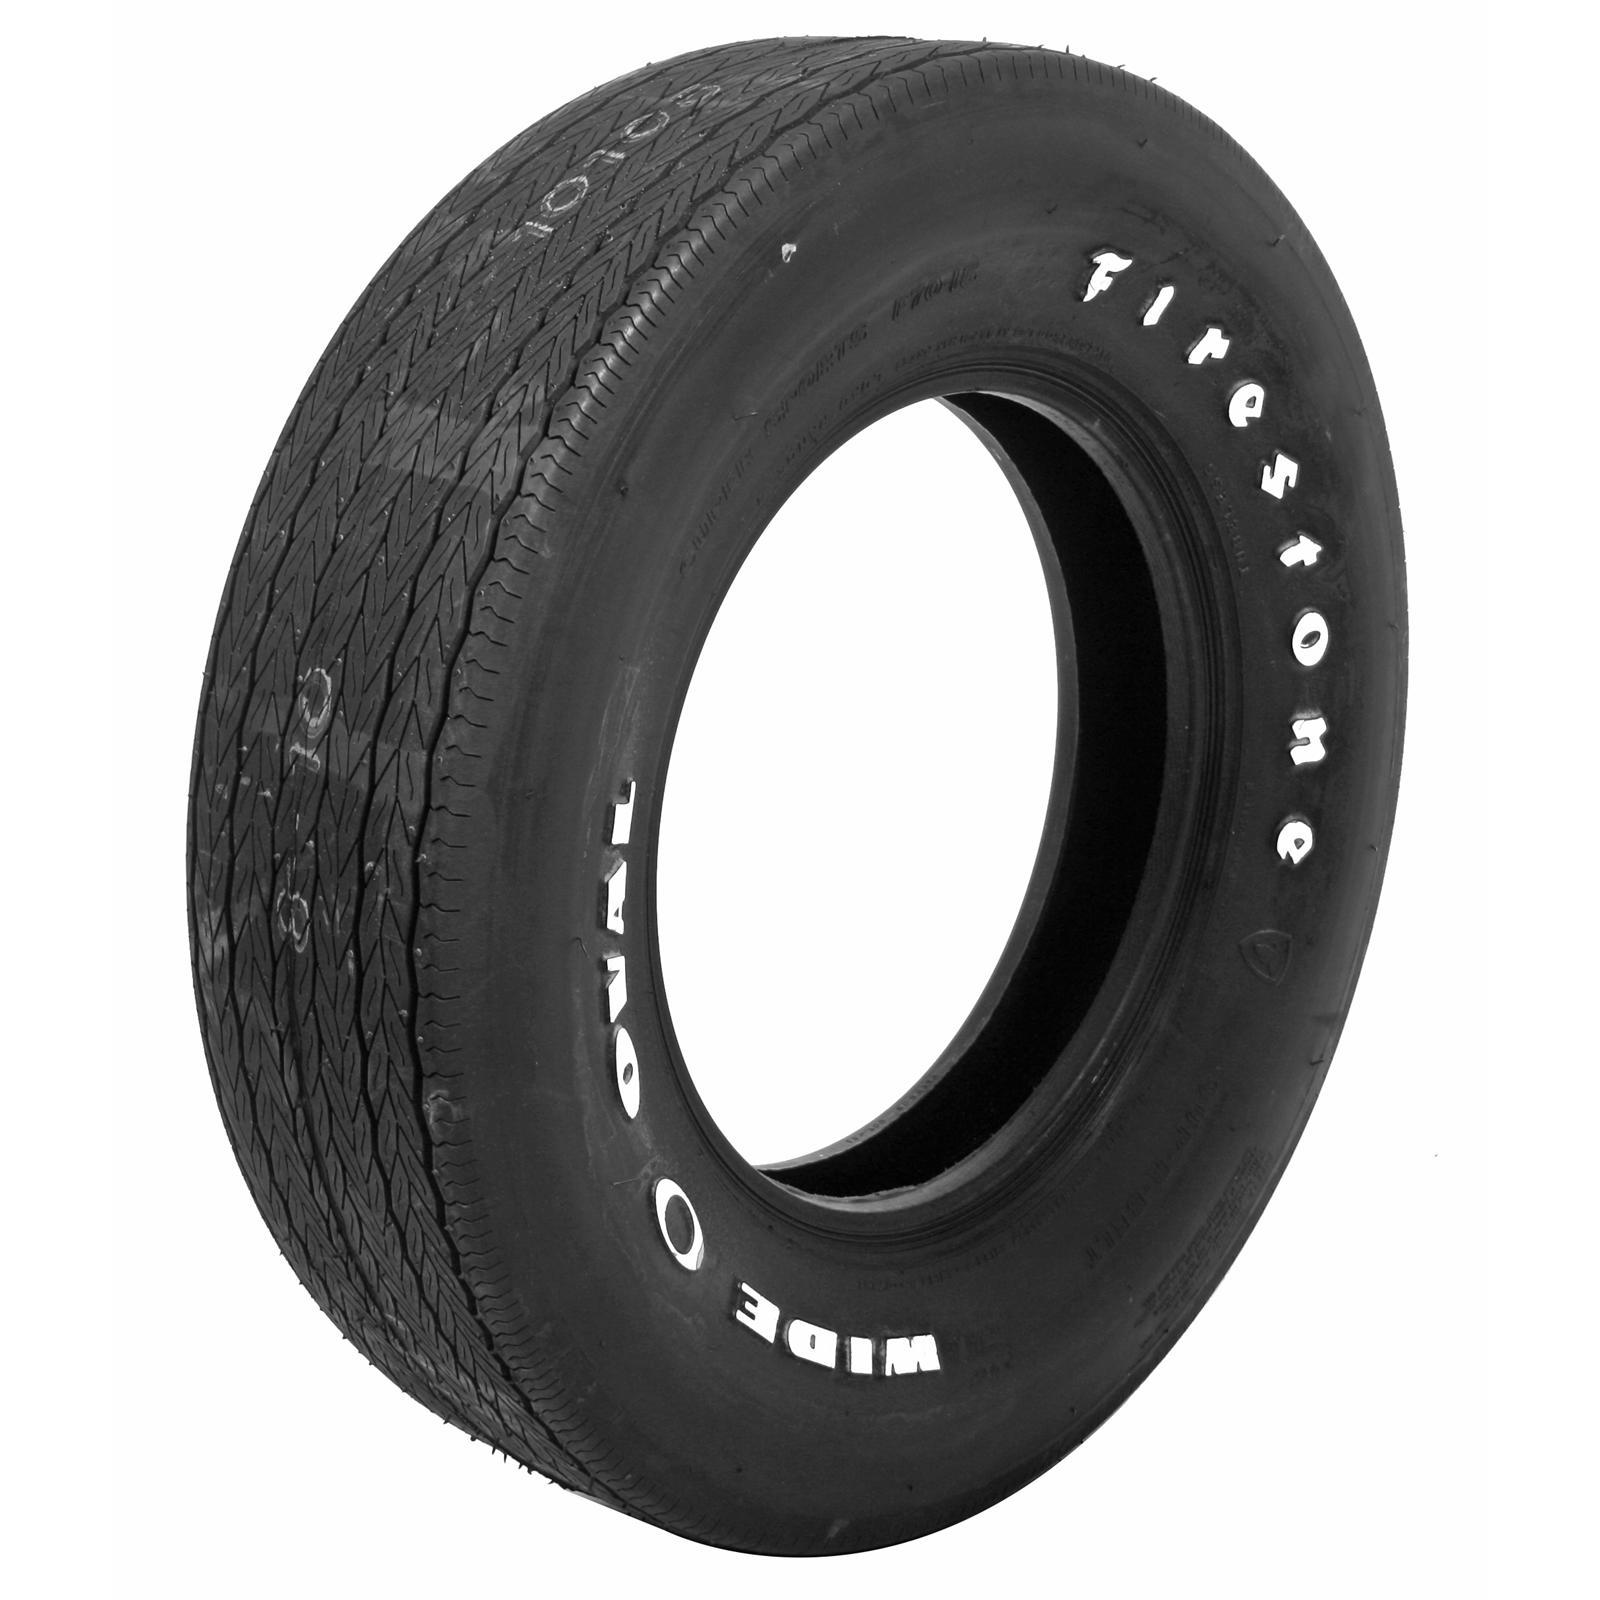 Set of 4 Coker Firestone Wide Oval Tires F70 15 Bias ply Wht Letter